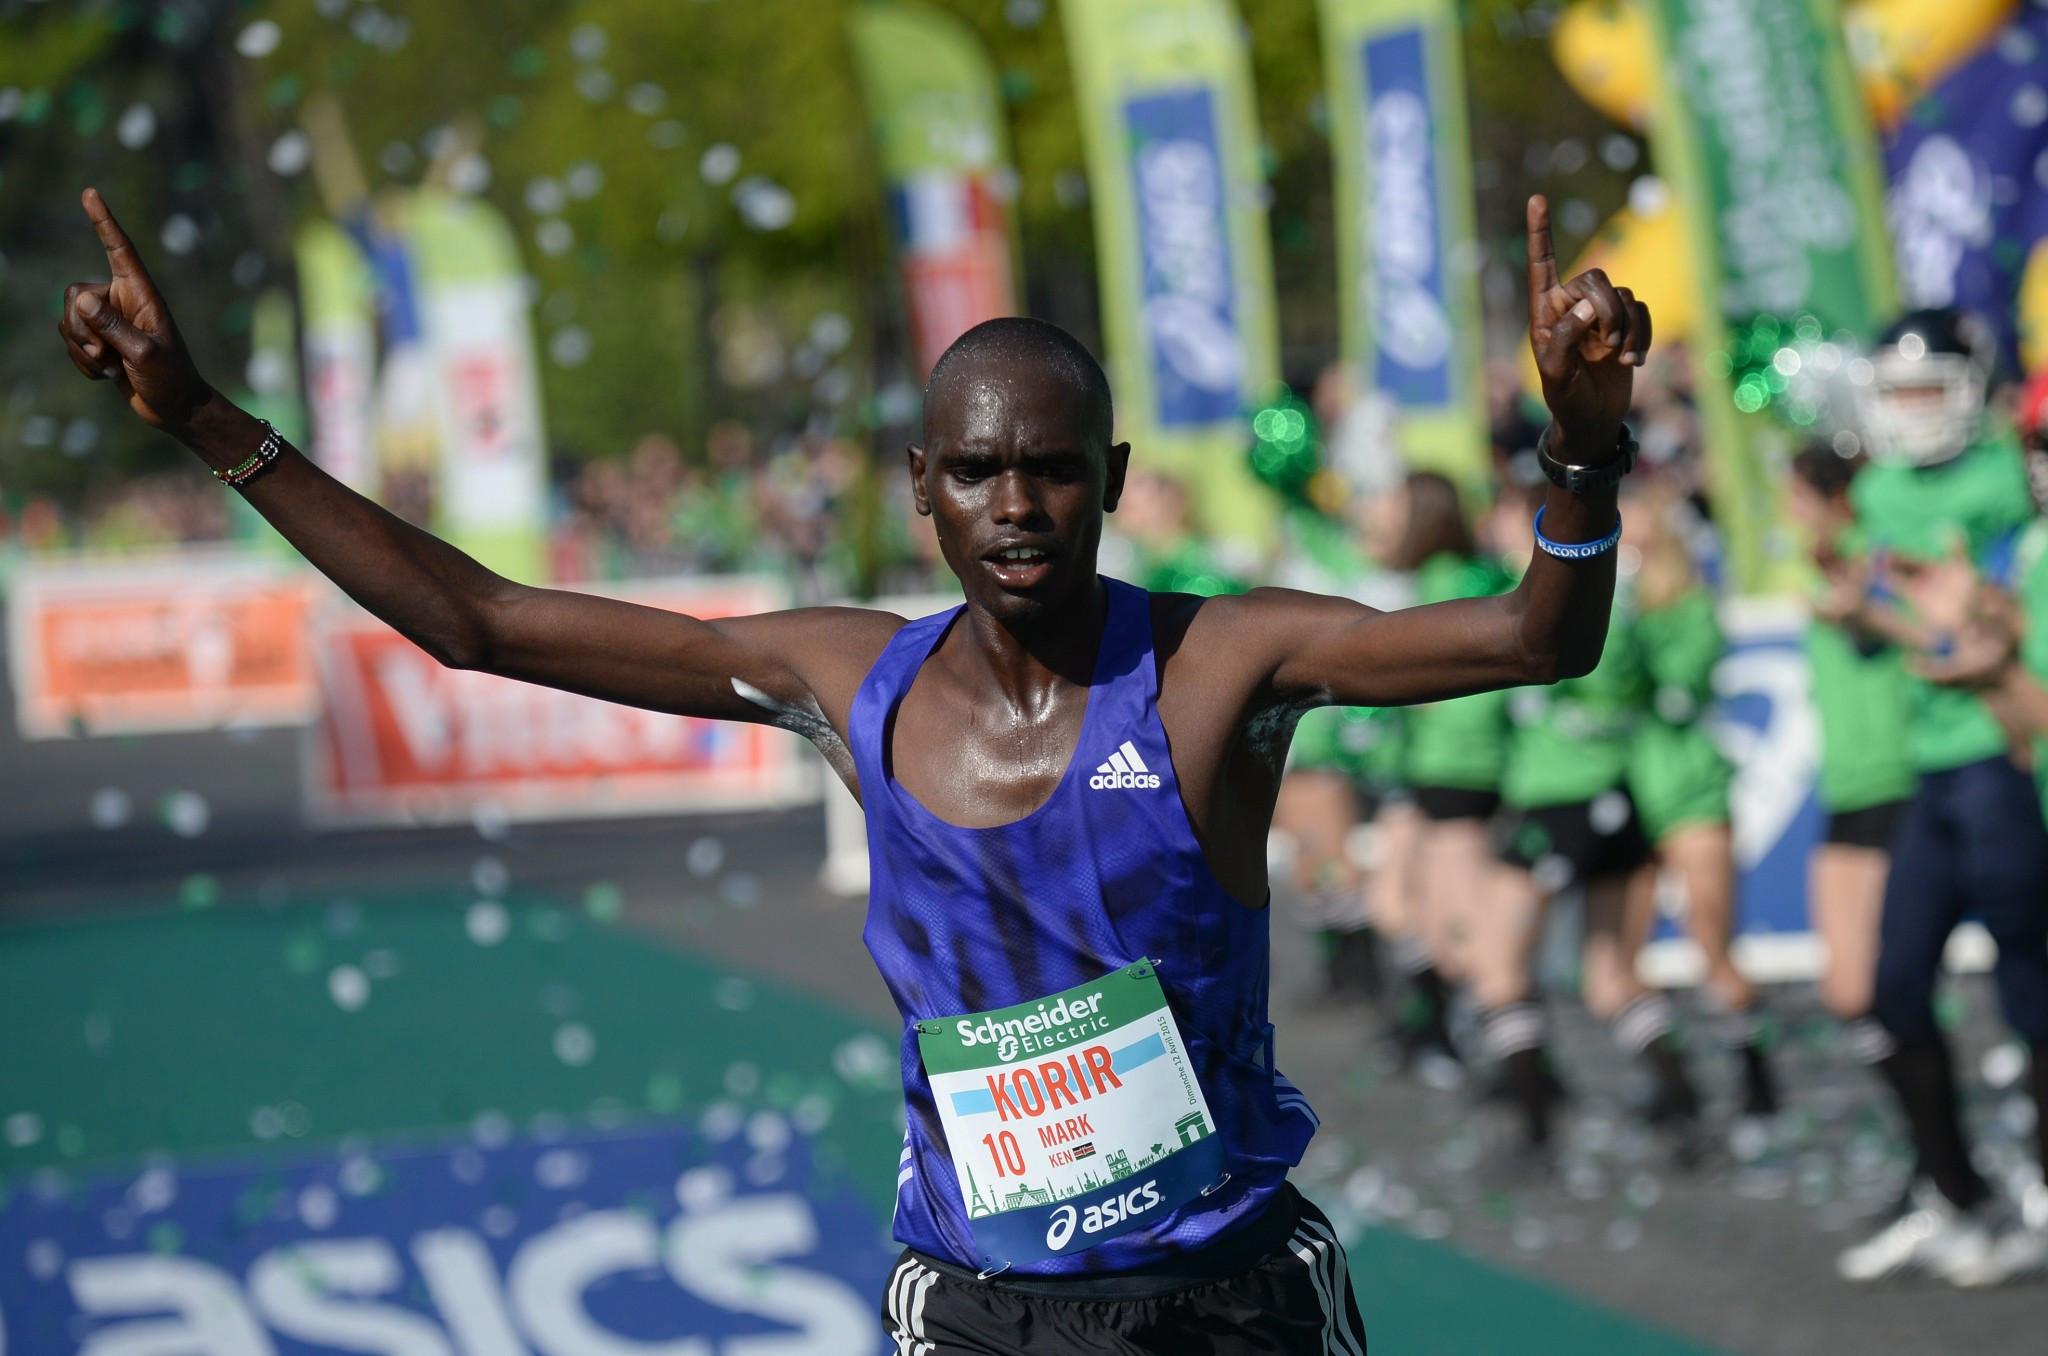 Victory for Kenyan Korir and Ethiopian Mengistu at Paris Marathon